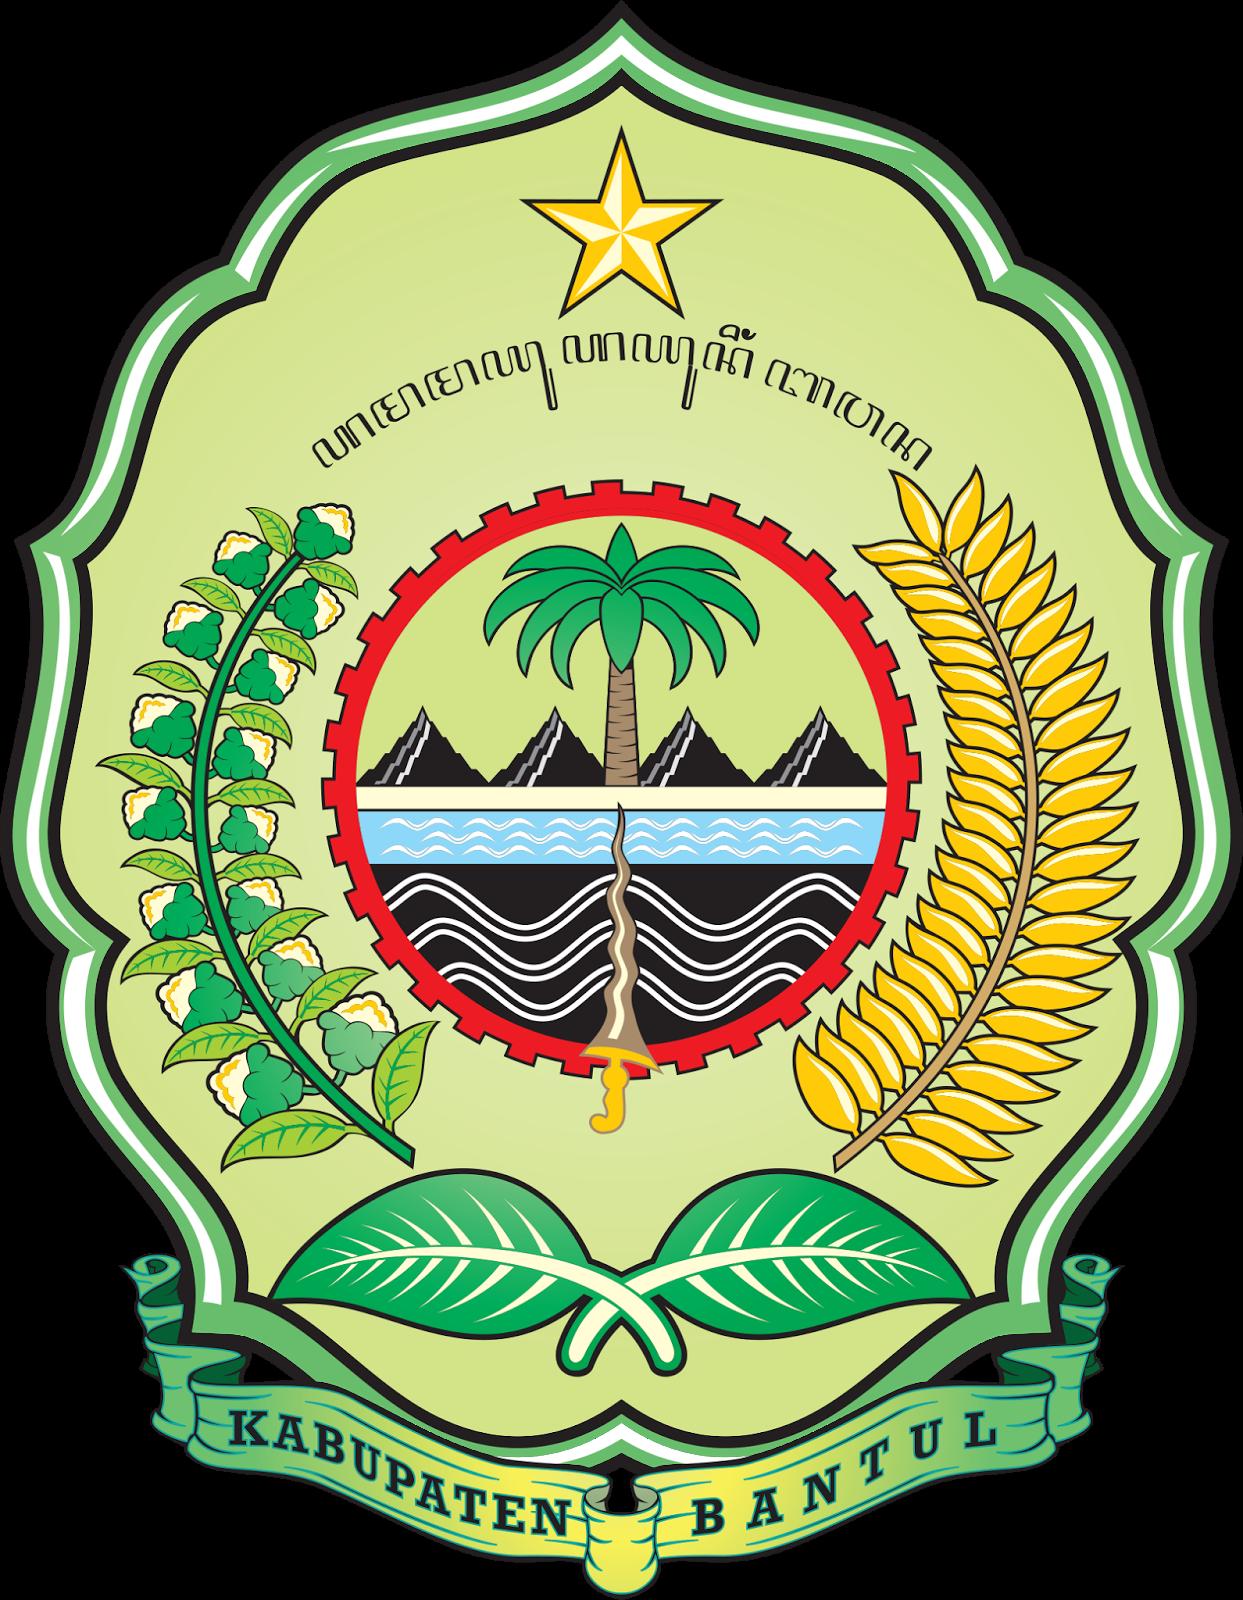 Logo Pemeintah Kabupaten Bantul Yogyakarta